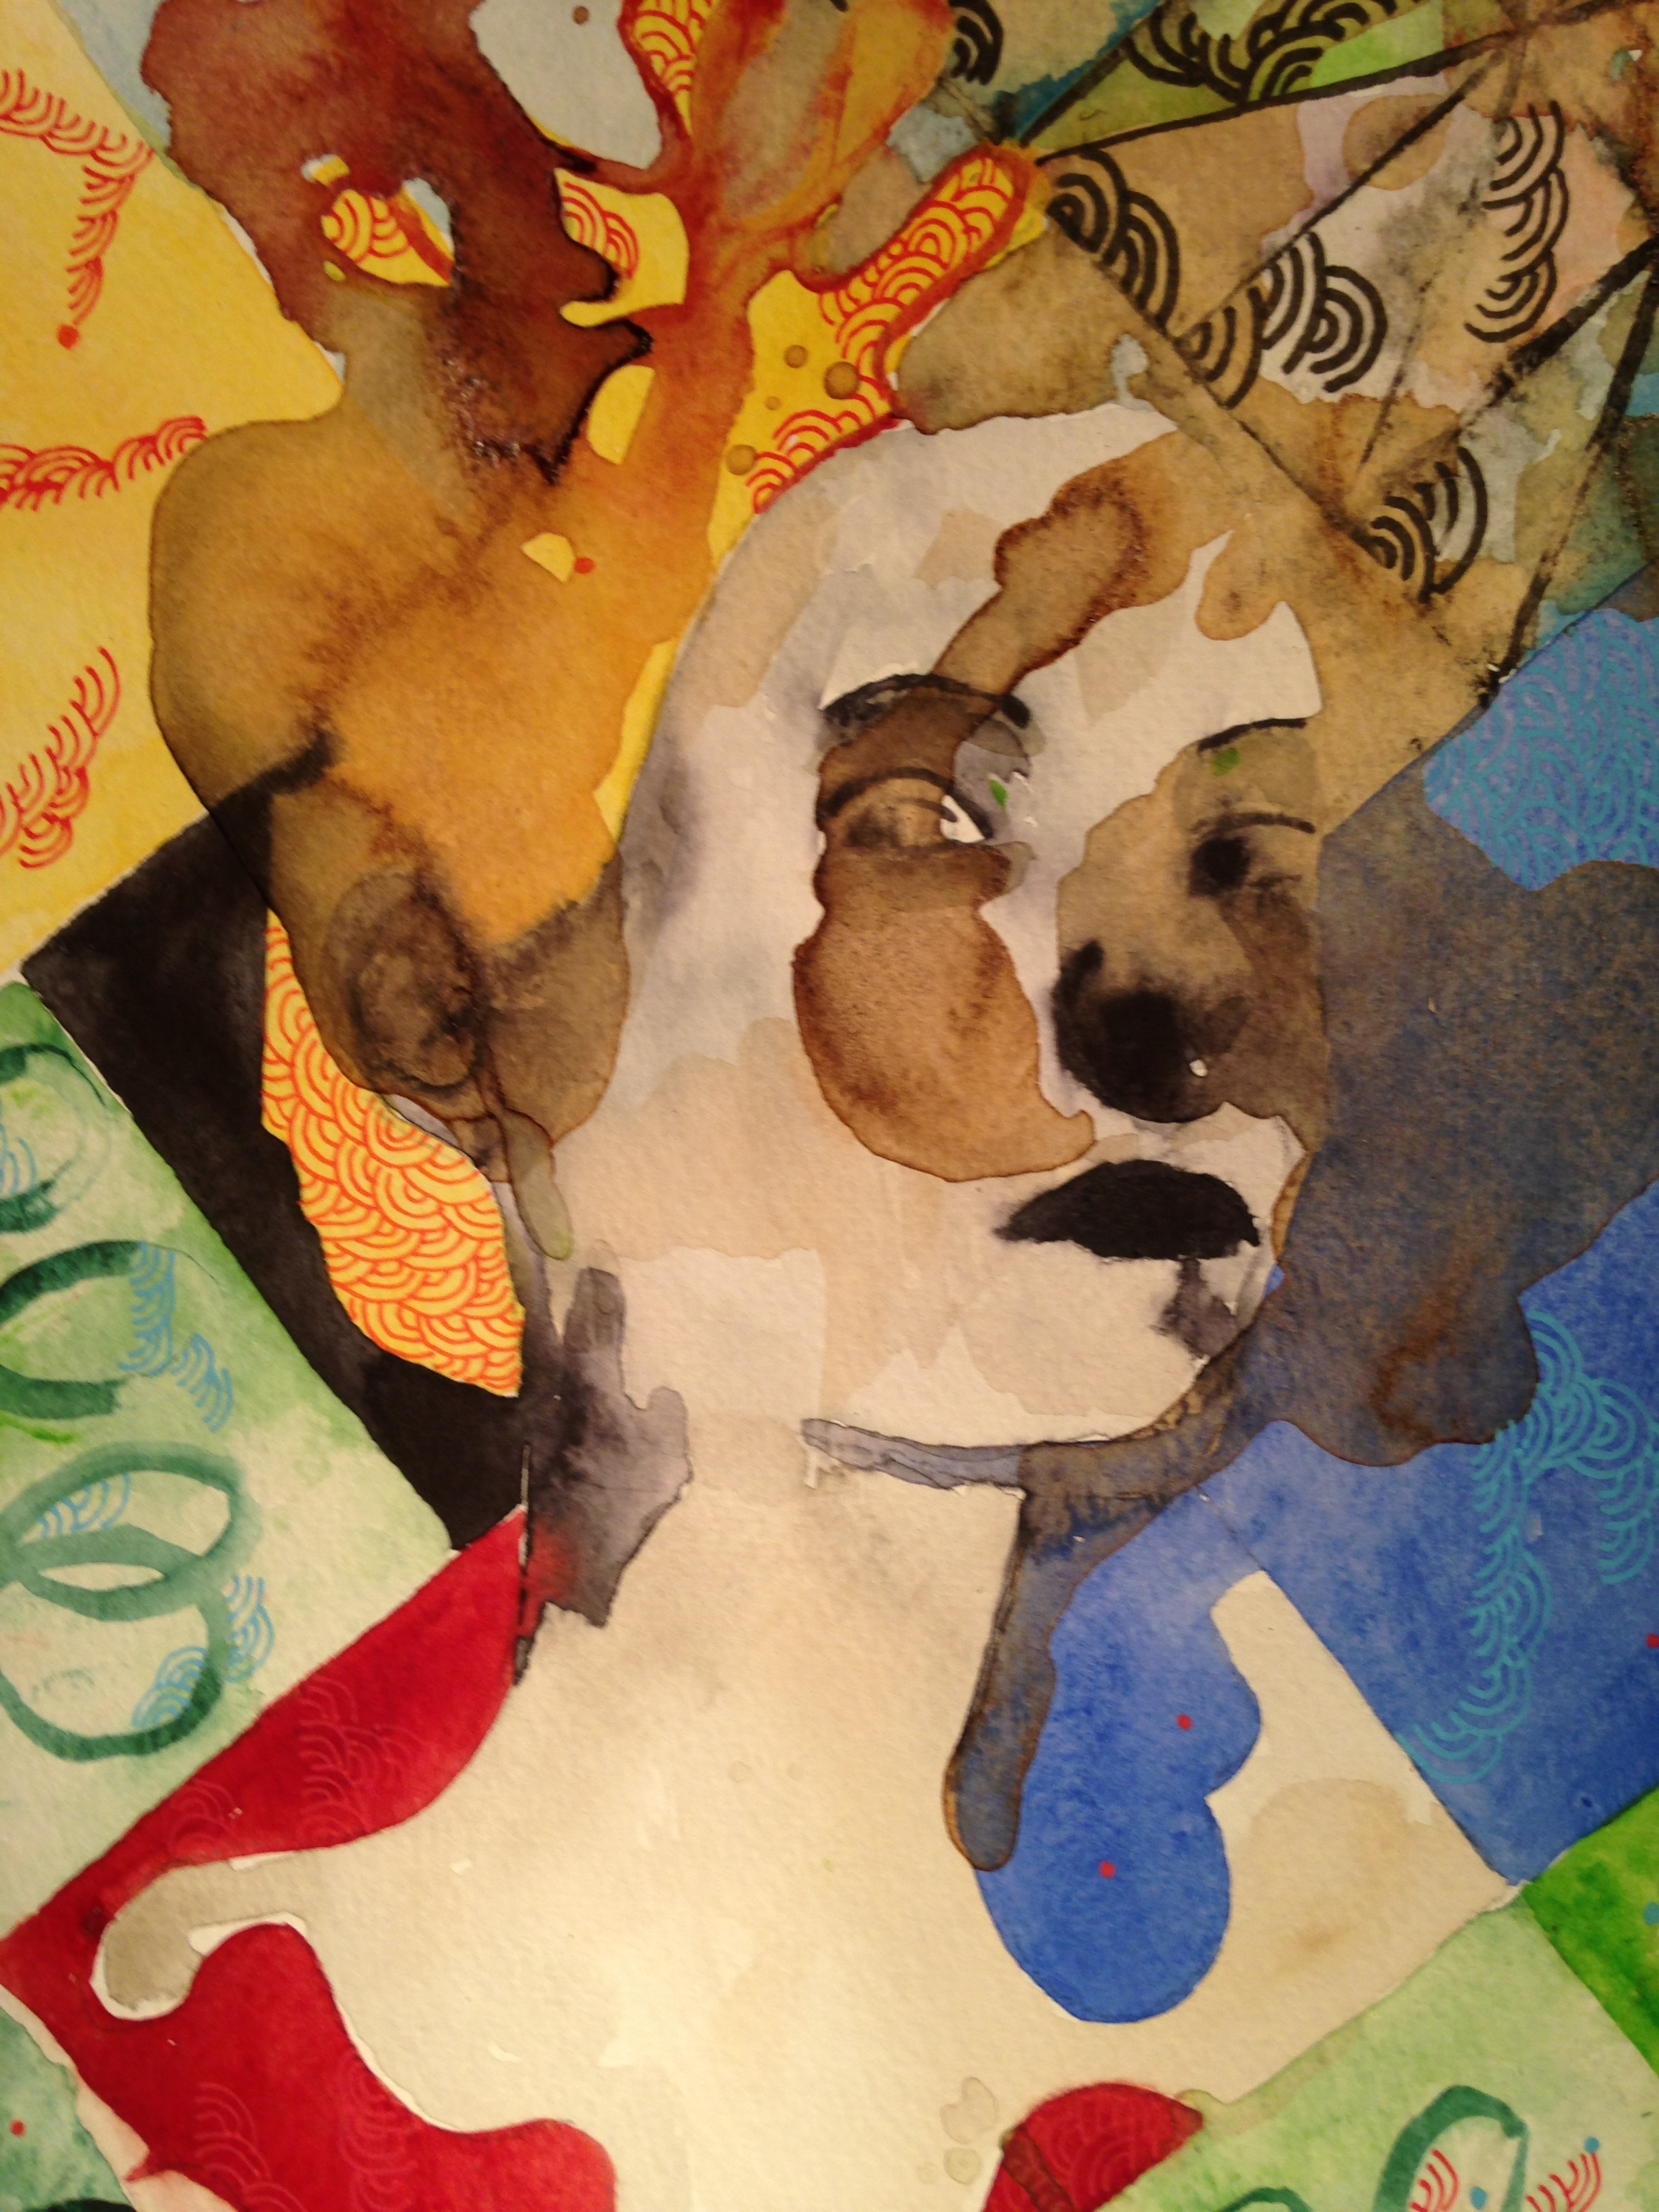 Panienko Lautrec - Gilles Konop - KAZoART